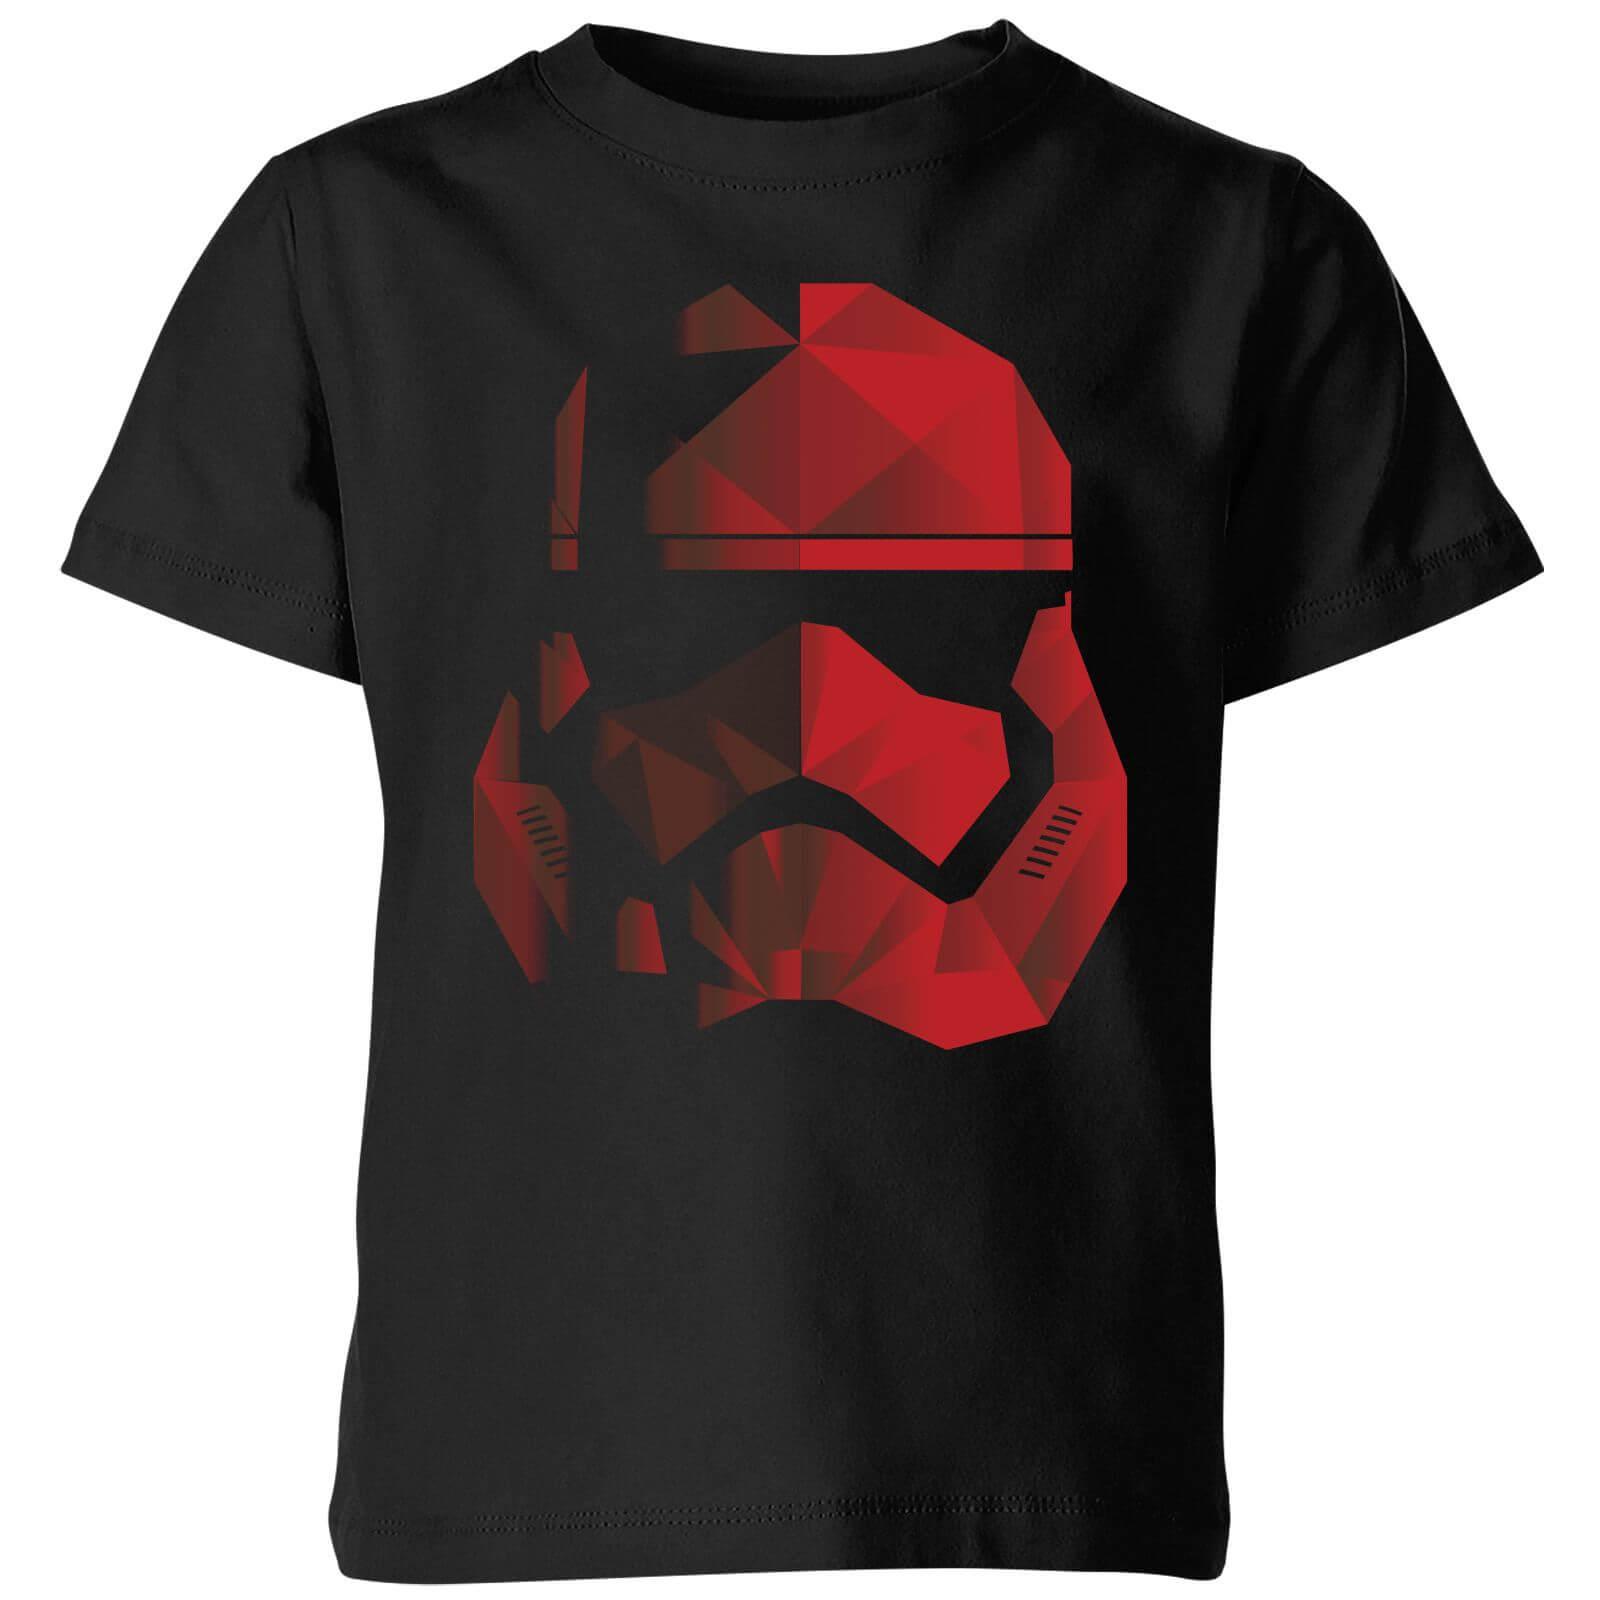 Star Wars T-Shirt Enfant Casque Stormtrooper Effet Cubiste - Star Wars - Noir - 7-8 ans - Noir